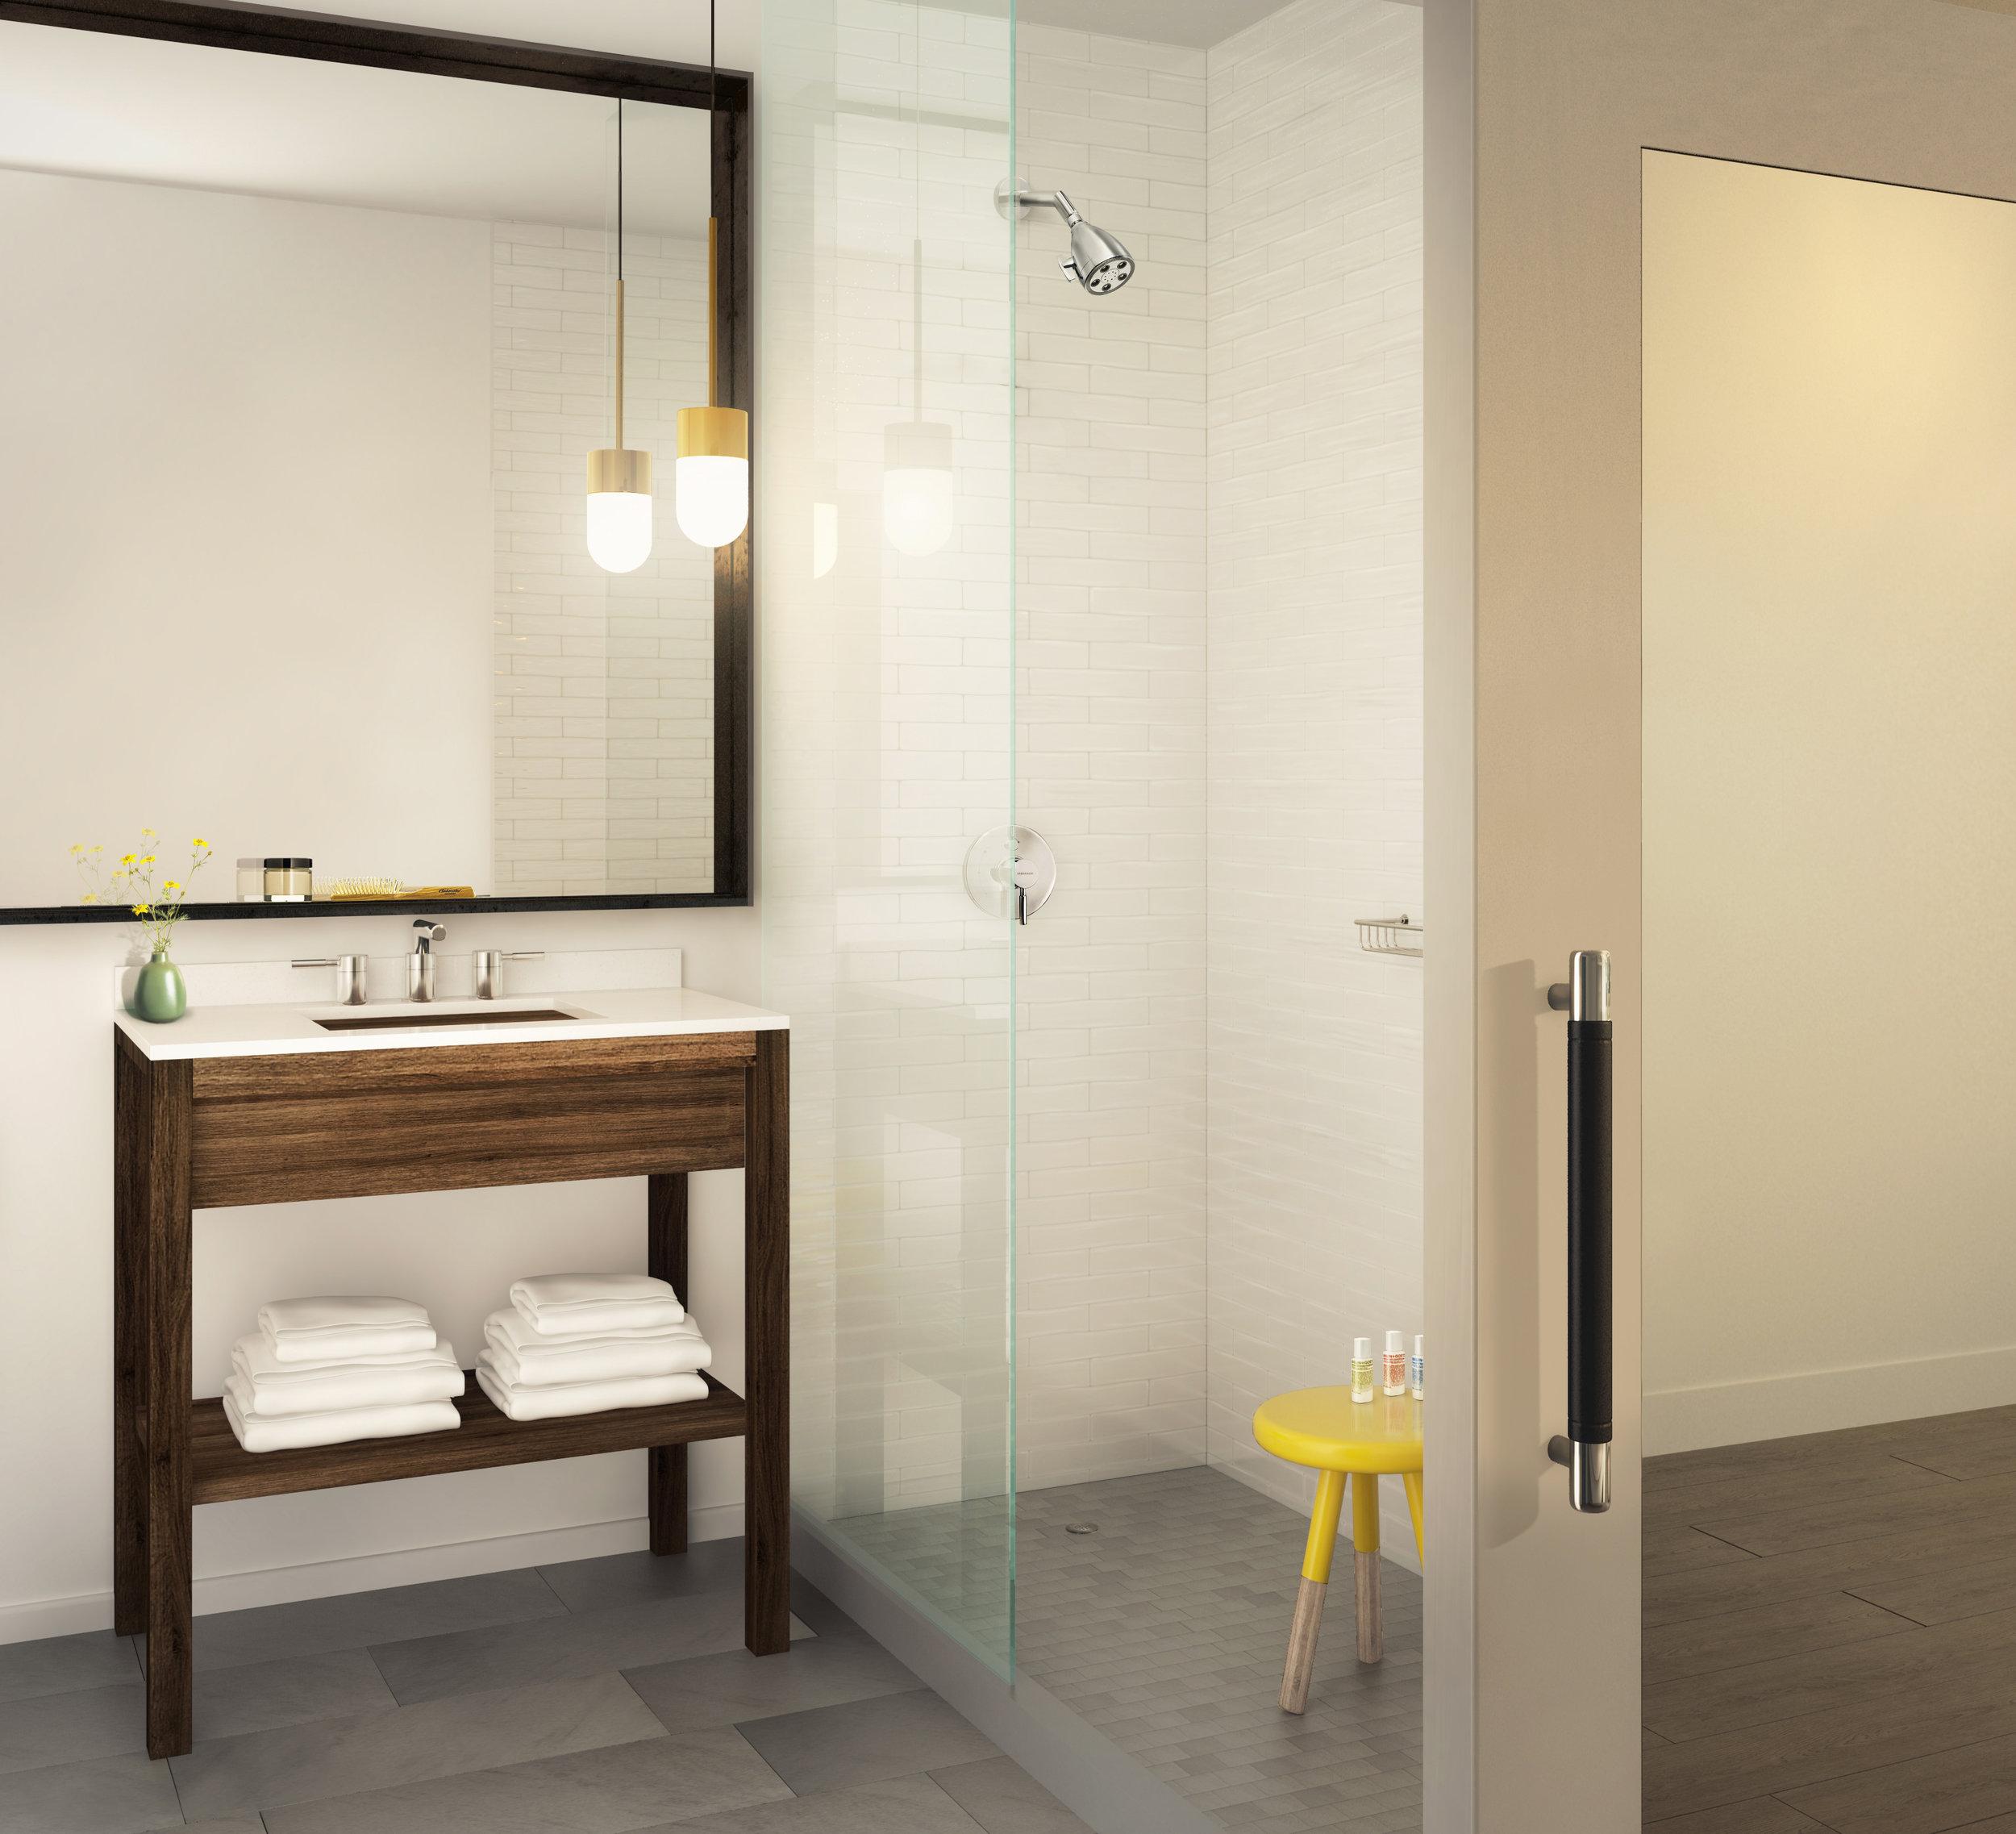 Hotel - Bathroom HR_09-10.jpg